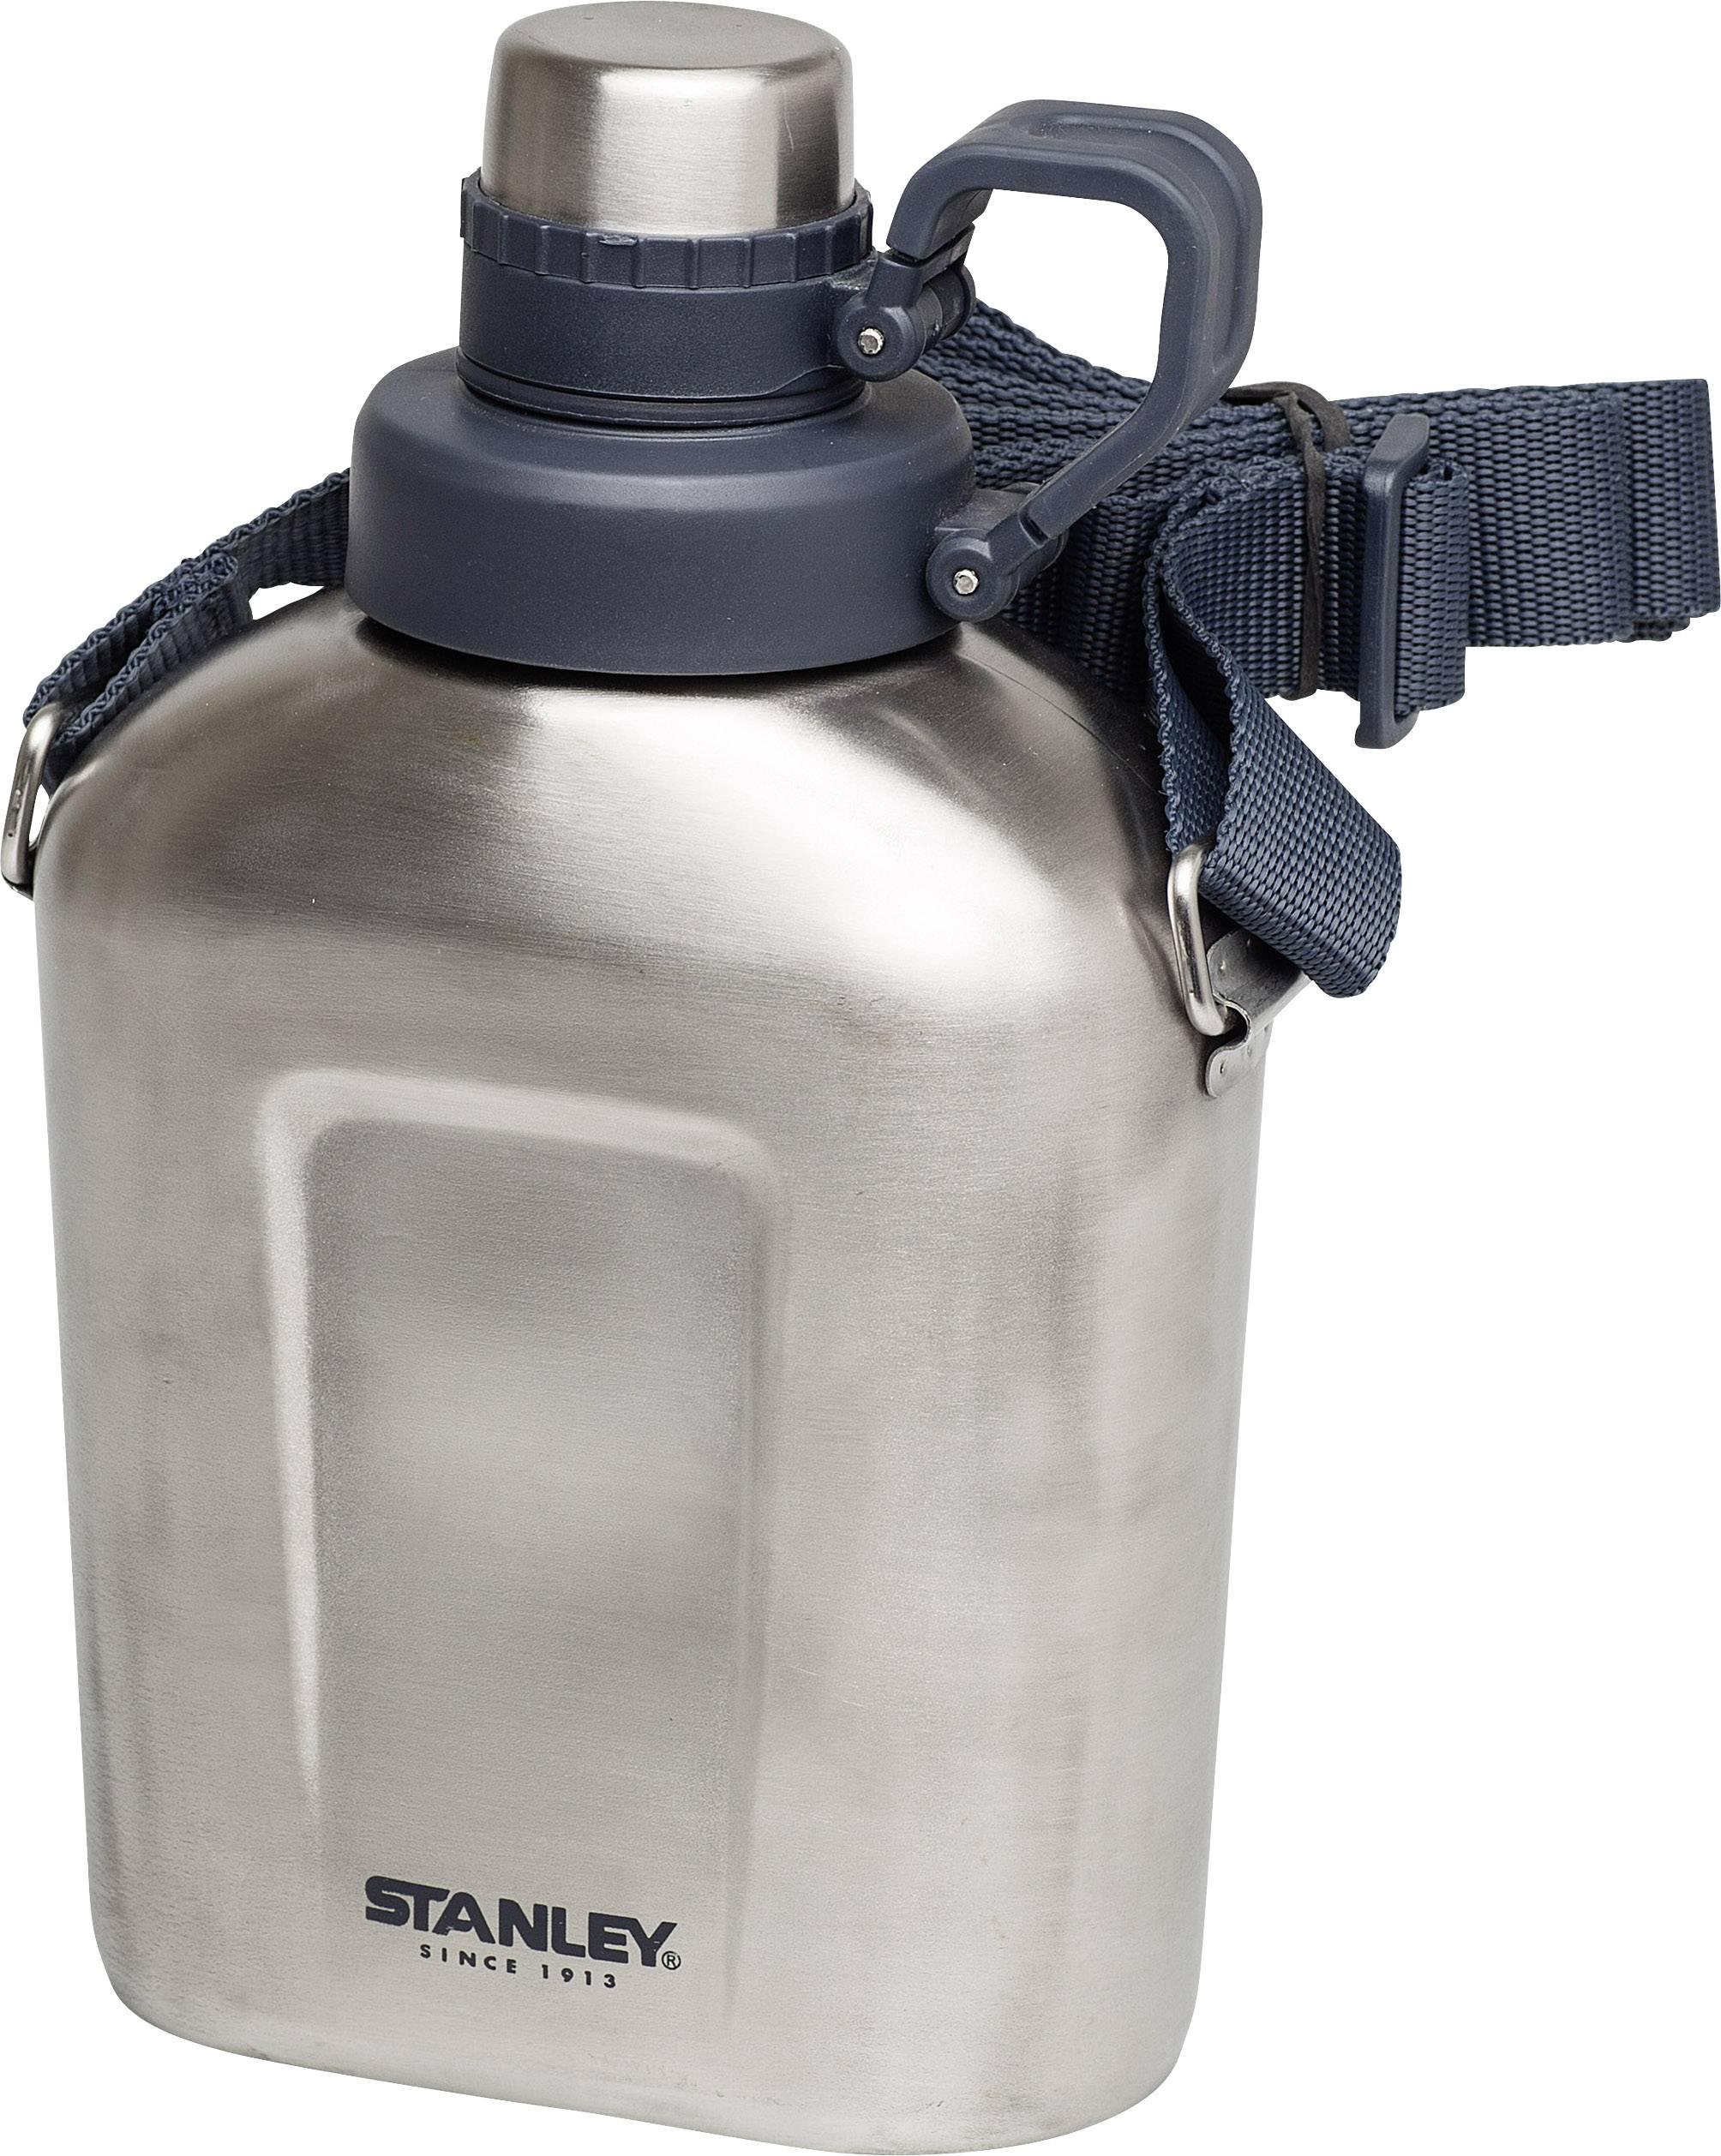 Stanley lahev 1000 ml nerezová ocel 10-01930-001 Adventure Feldflasche